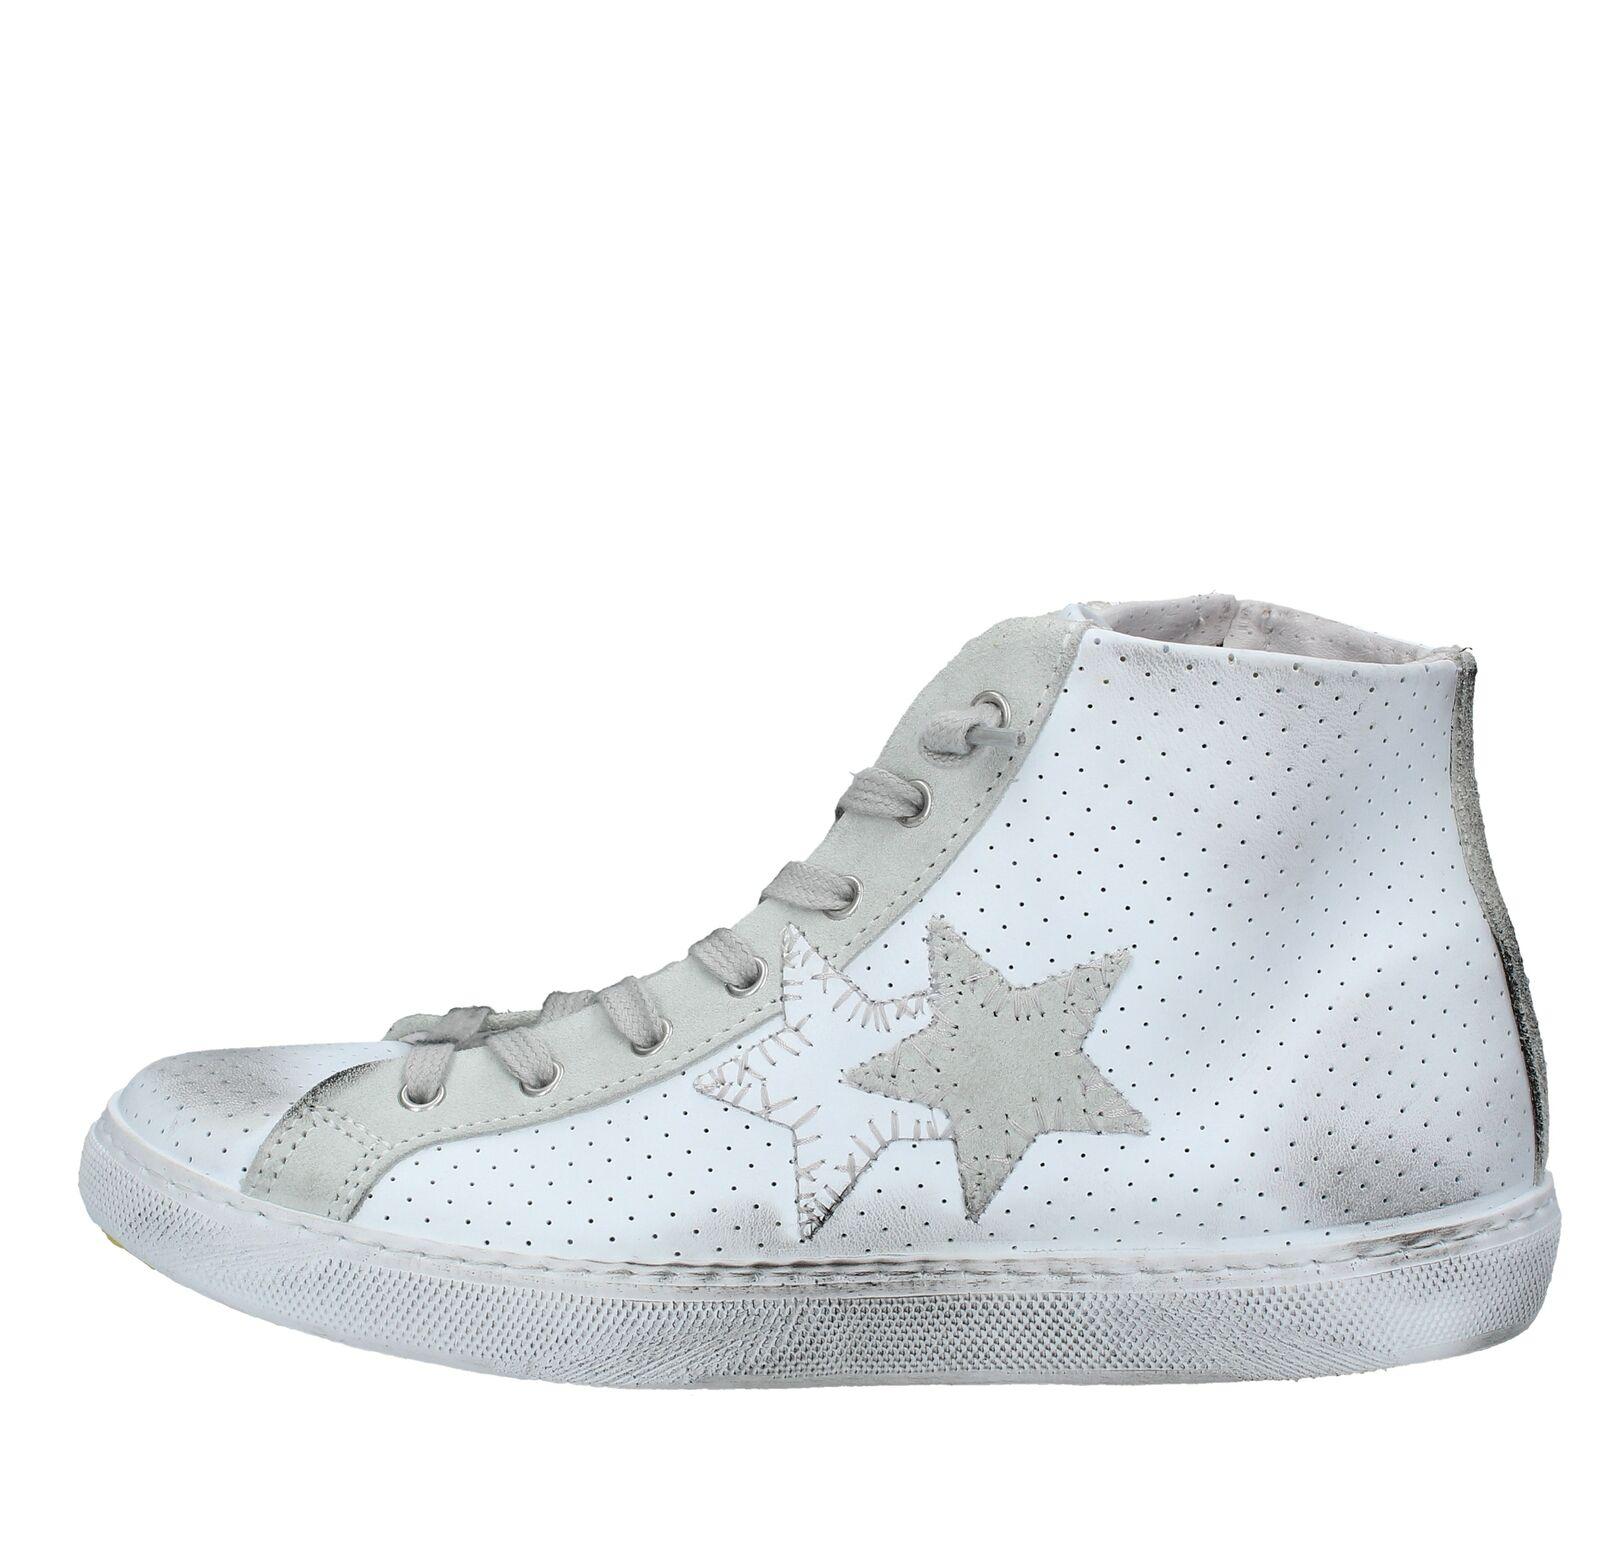 AMF78_2STA Scarpe scarpe da ginnastica 2STAR uomo Bianco | Forte valore  | Scolaro/Ragazze Scarpa